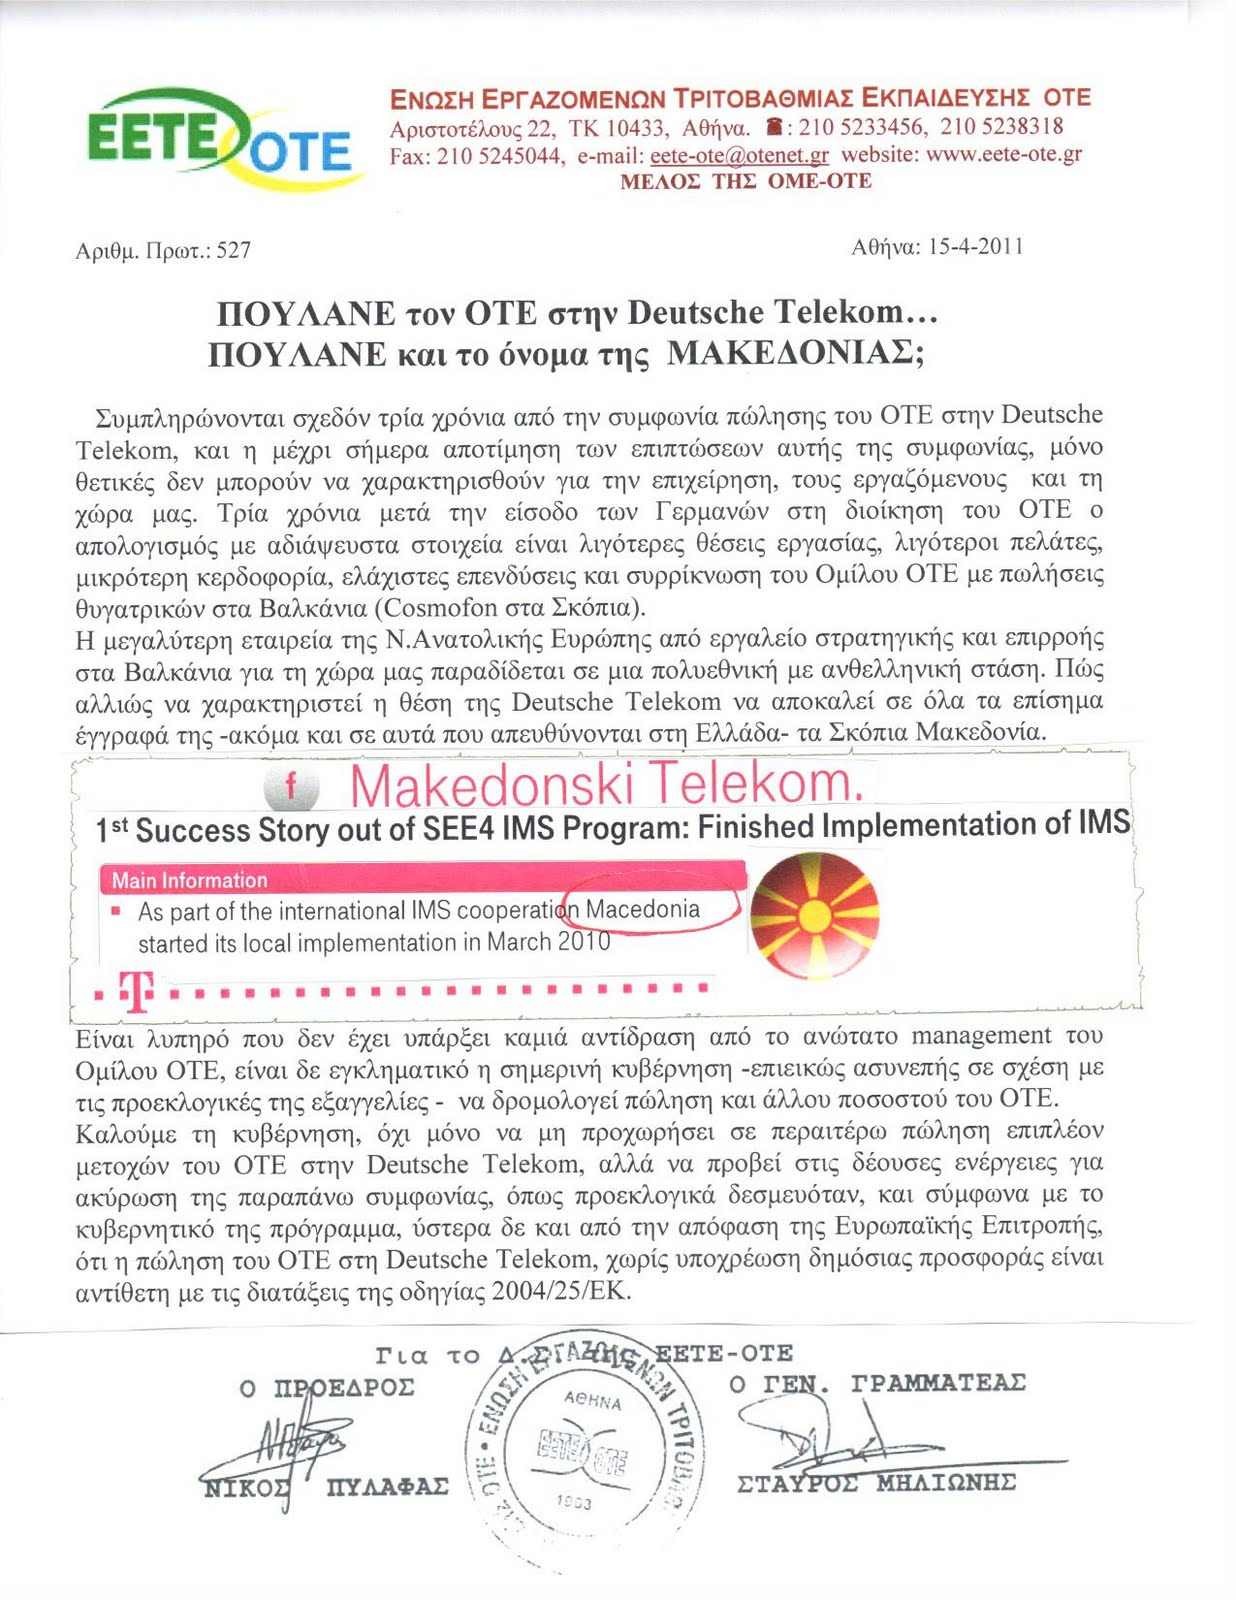 deutsce macedonia ΠΟΥΛΑΝΕ τον ΟΤΕ στη Deutsche Telekom... ΠΟΥΛΑΝΕ και την ονομασία της ΜΑΚΕΔΟΝΙΑΣ;